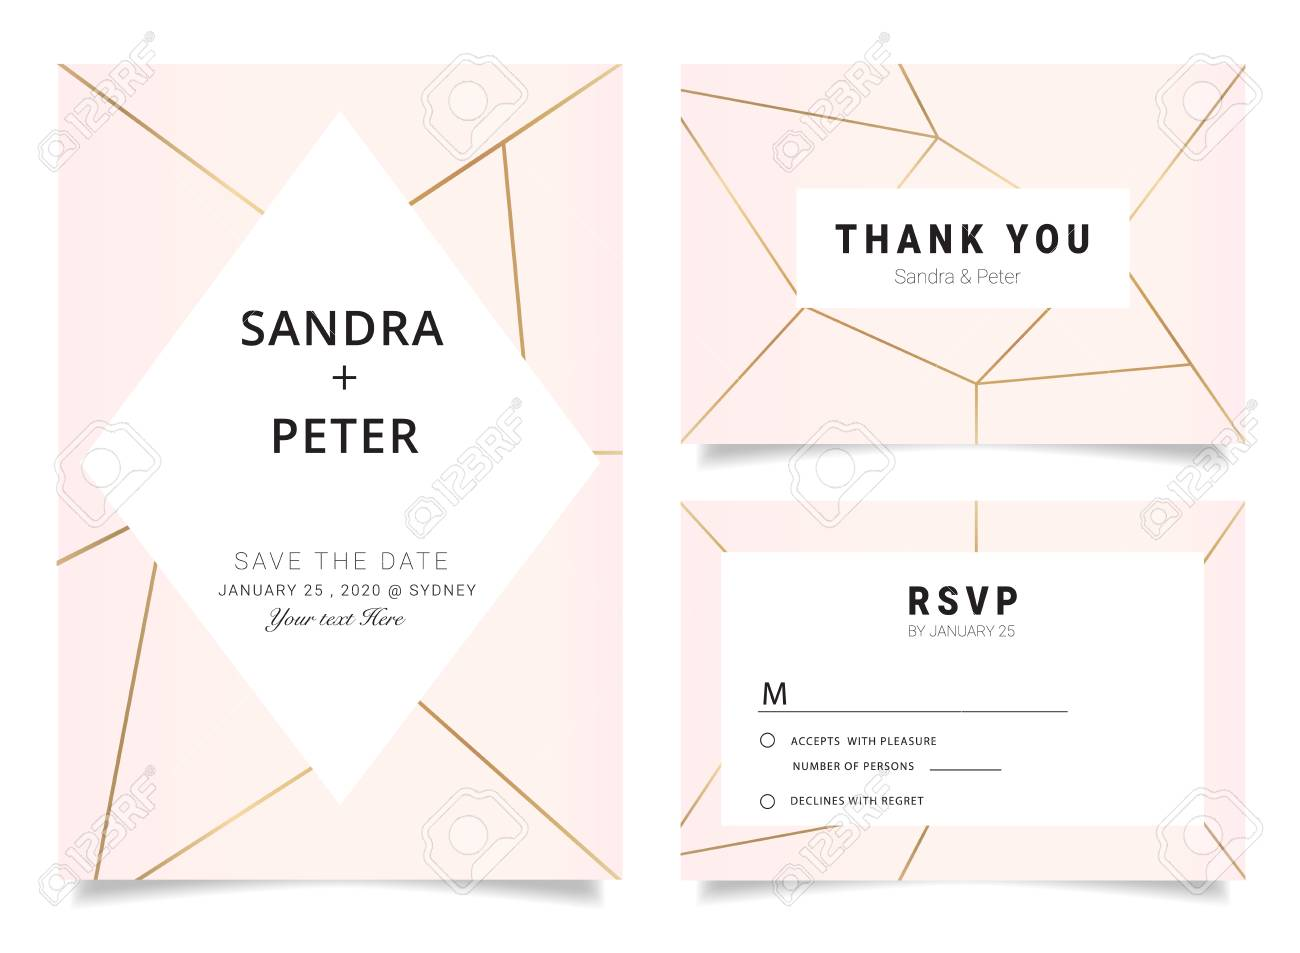 Wedding invitations set thank you card rsvp design with rose gold imagens wedding invitations set thank you card rsvp design with rose gold geometric shape pattern stopboris Images